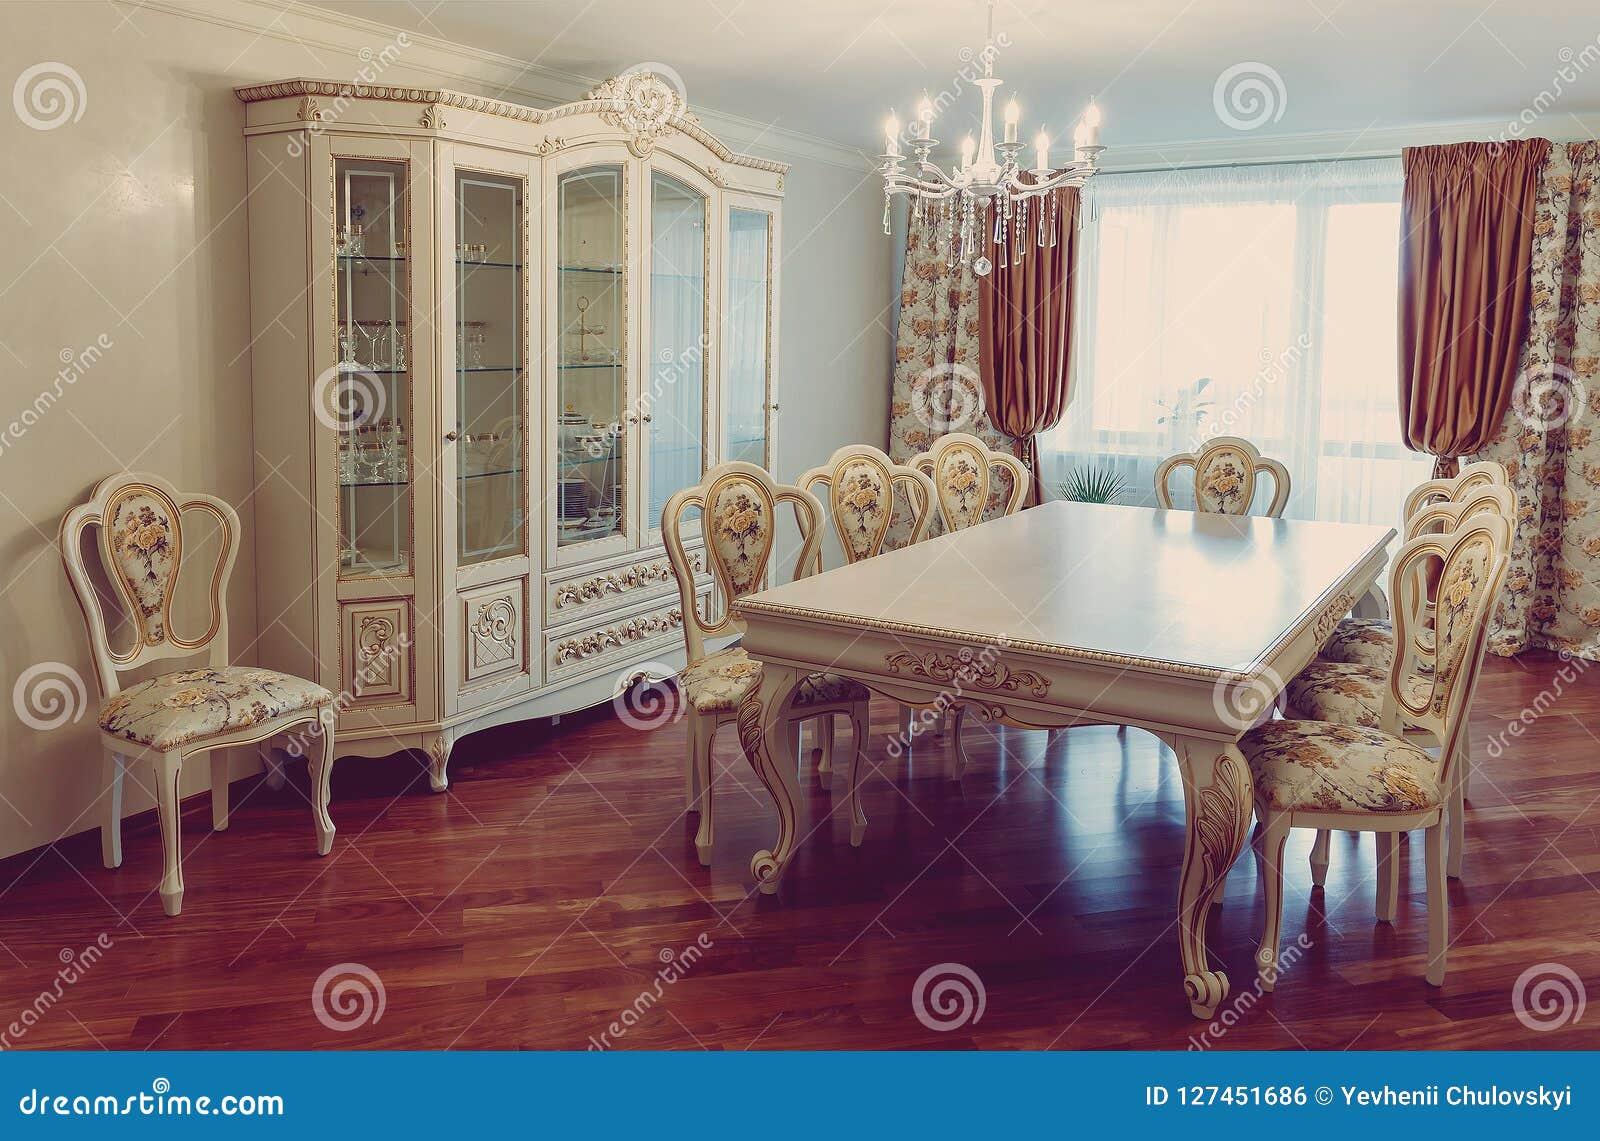 highend luxury furniture interior of modern living room